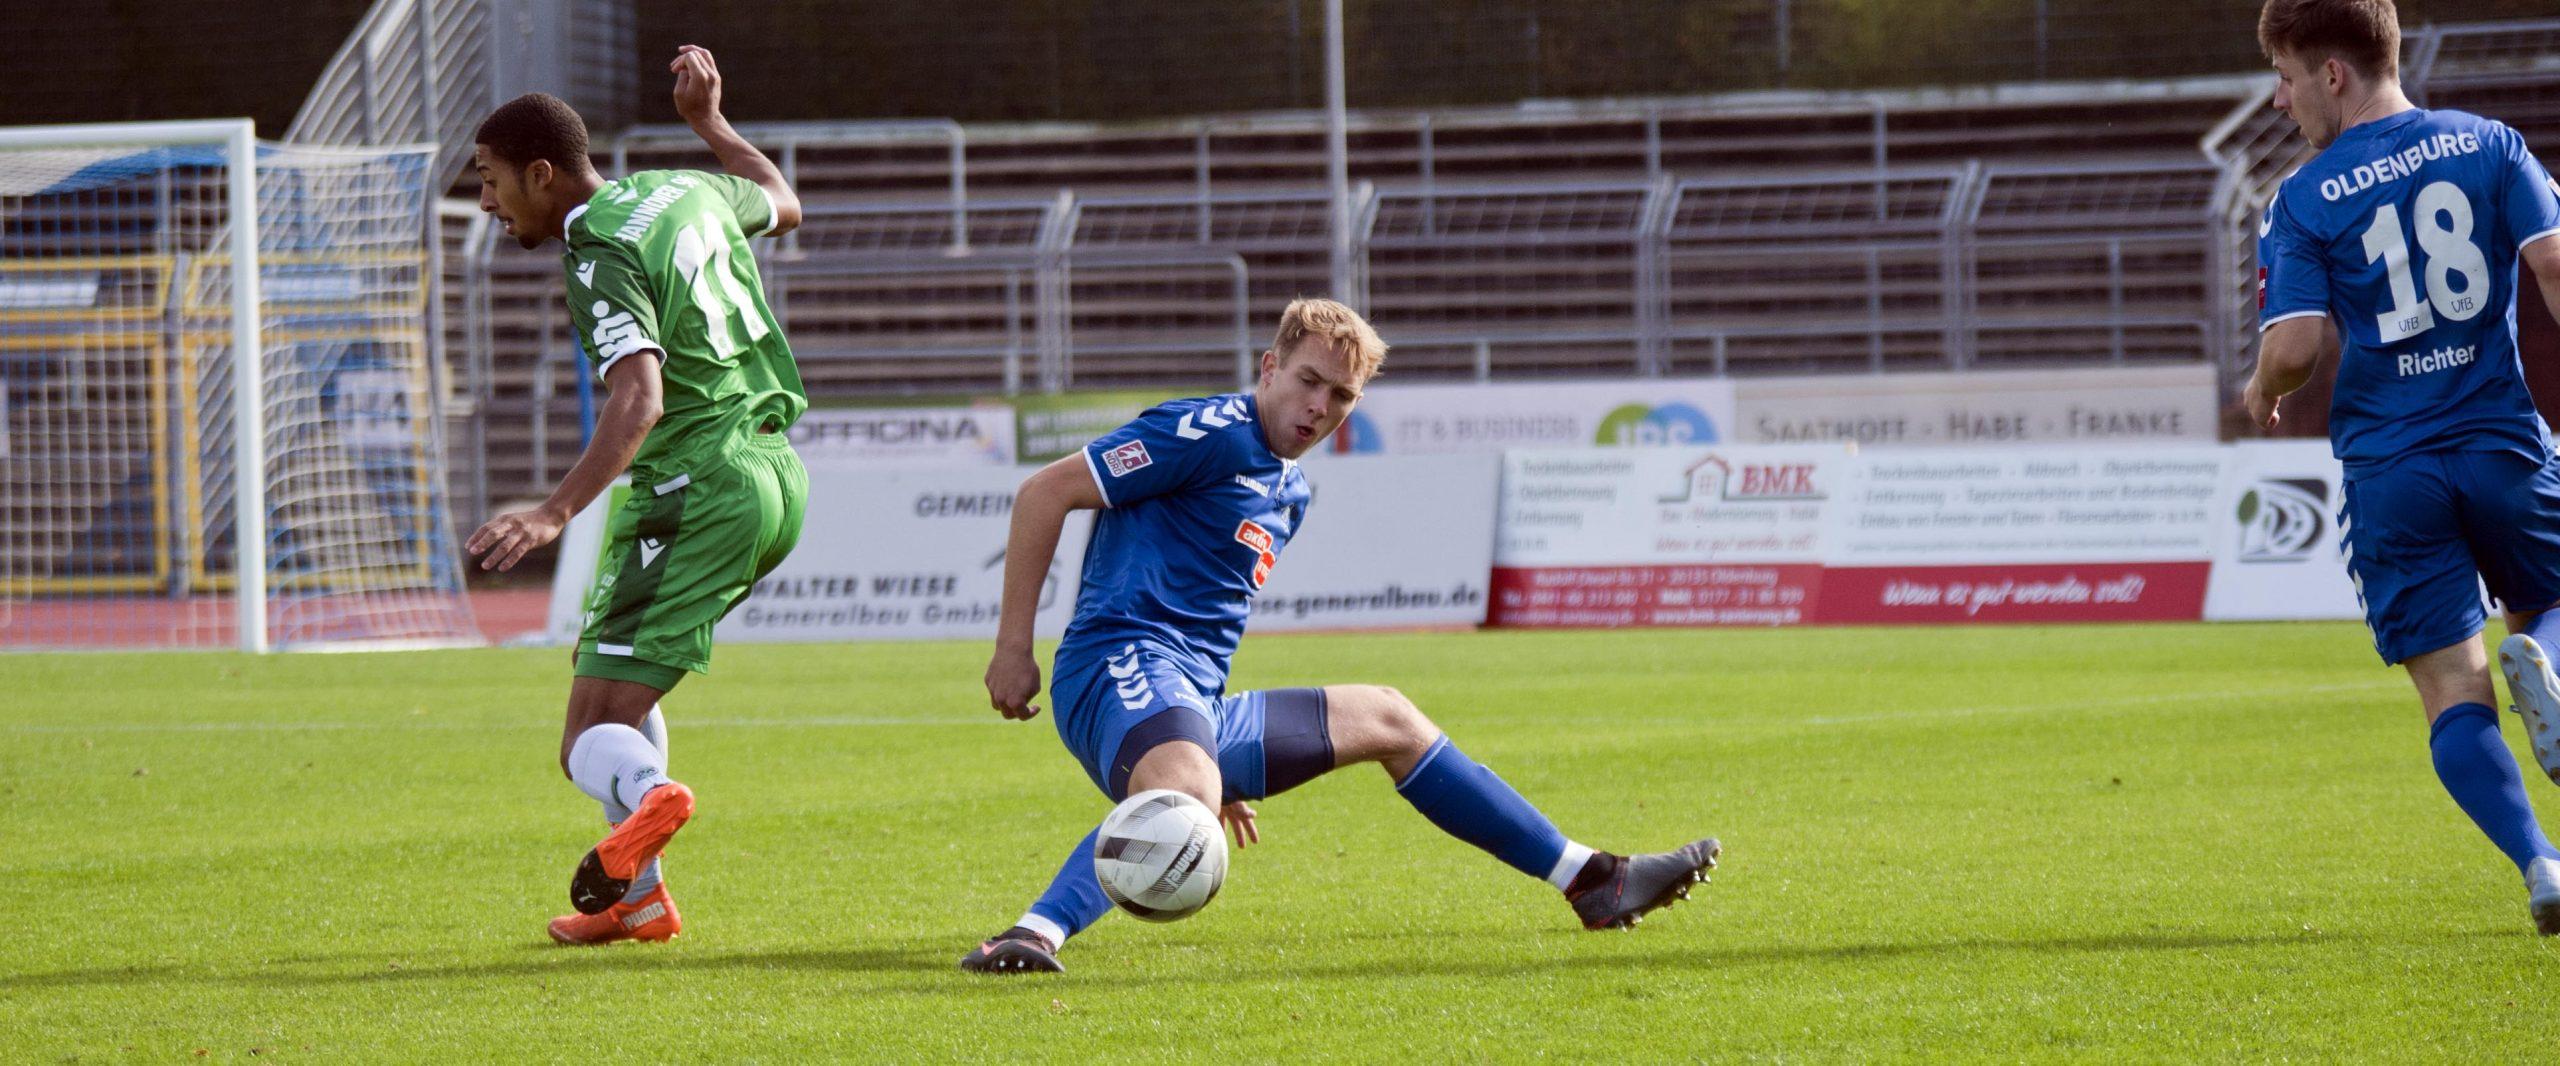 Fabian Herbst bleibt dem VfB erhalten